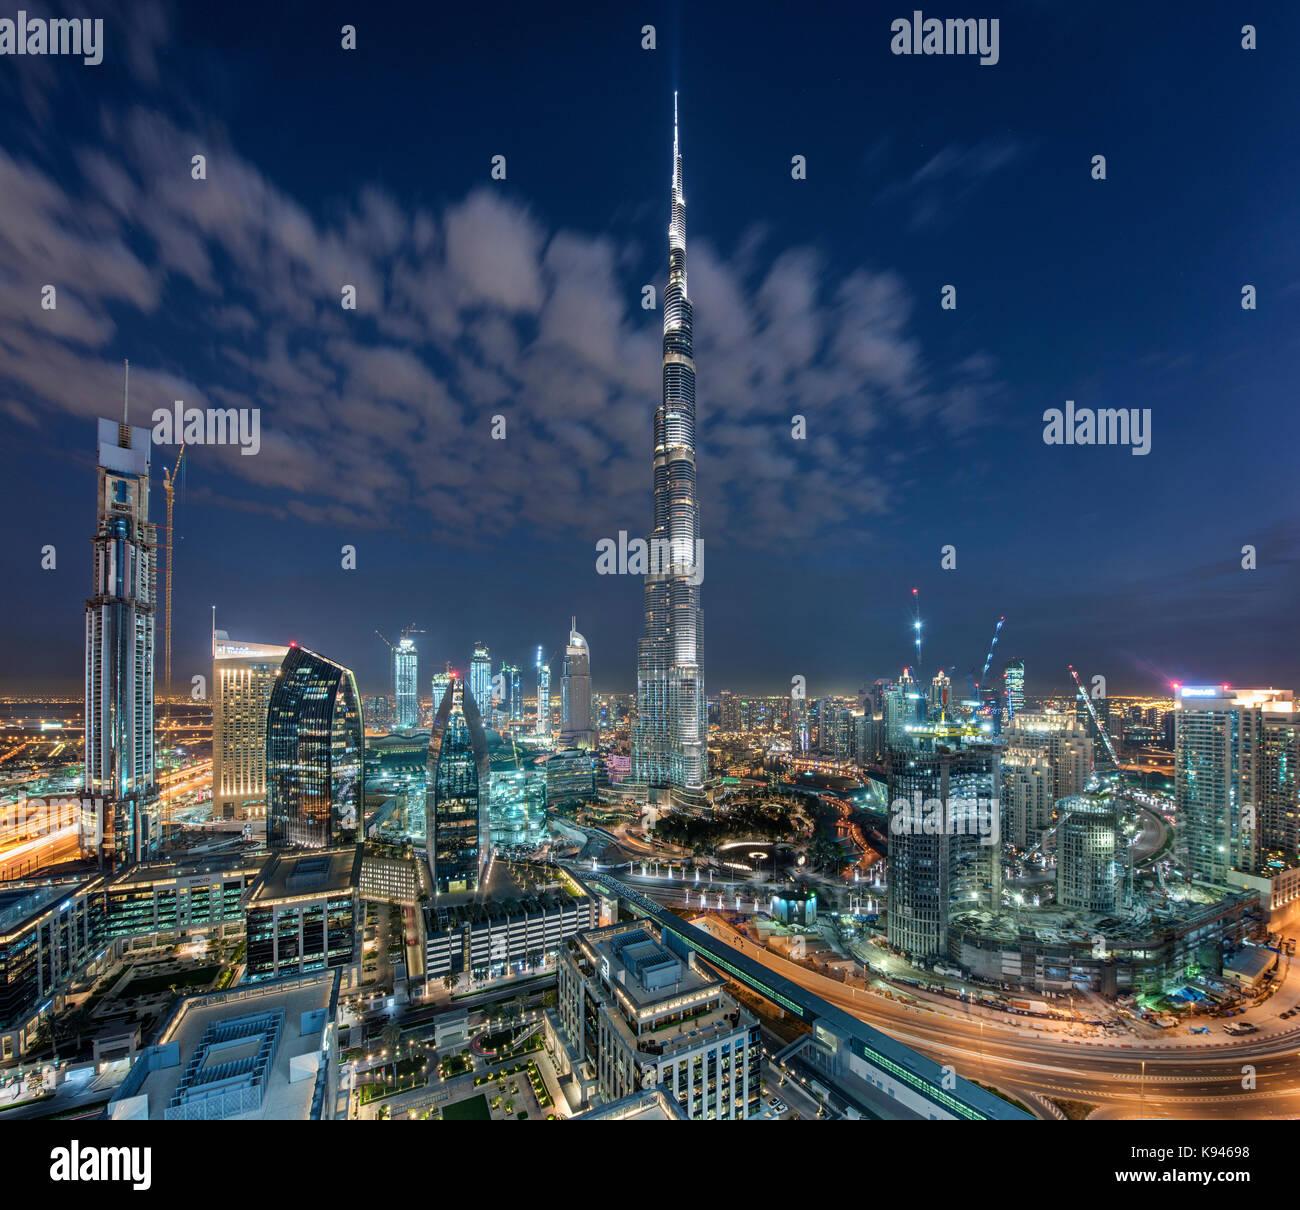 Cityscape of Dubai, United Arab Emirates at dusk, with the Burj Khalifa skyscraper and illuminated buildings in - Stock Image